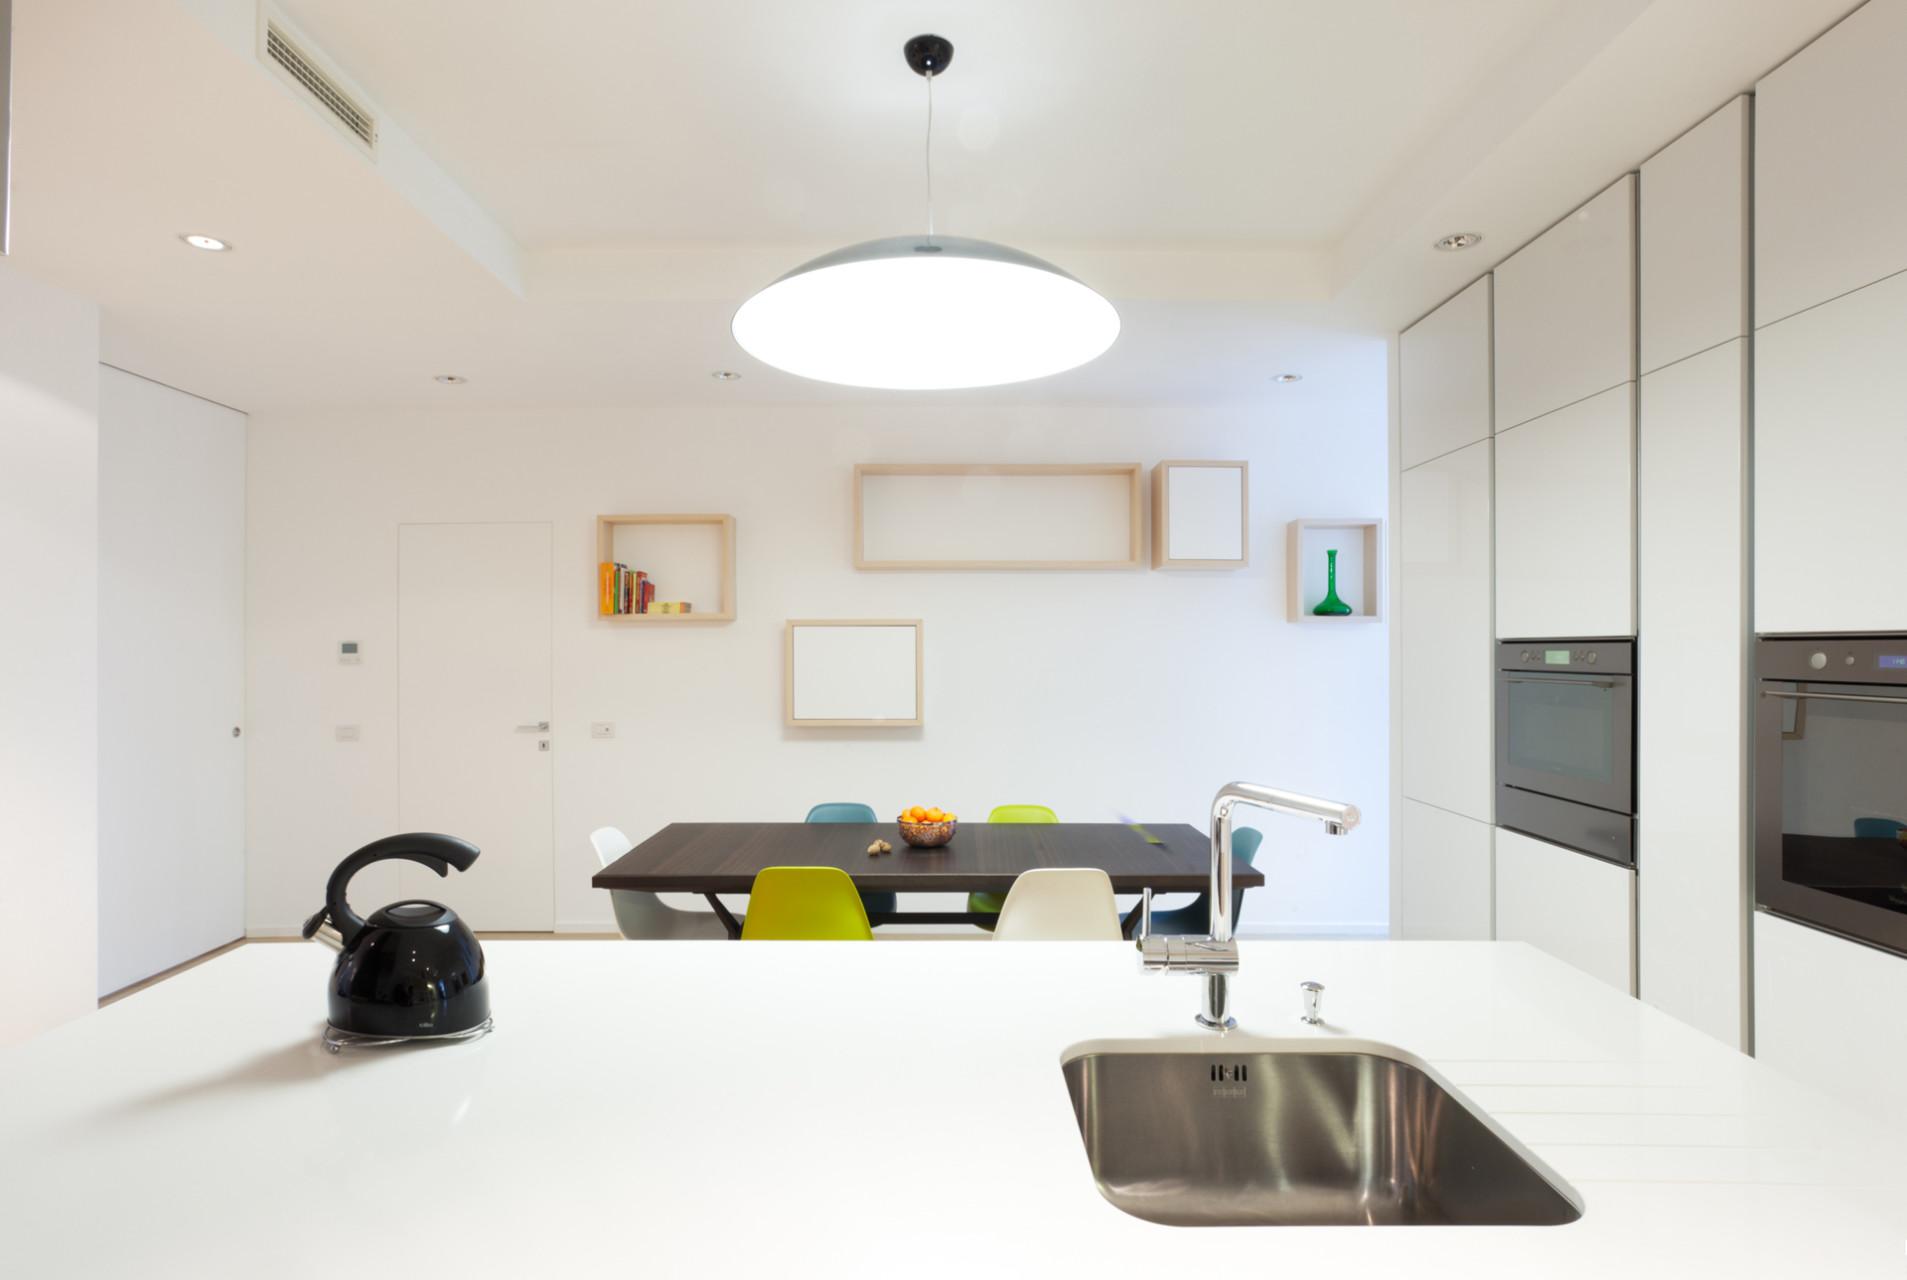 Wisp-Architects- Oxilia Apartment 4